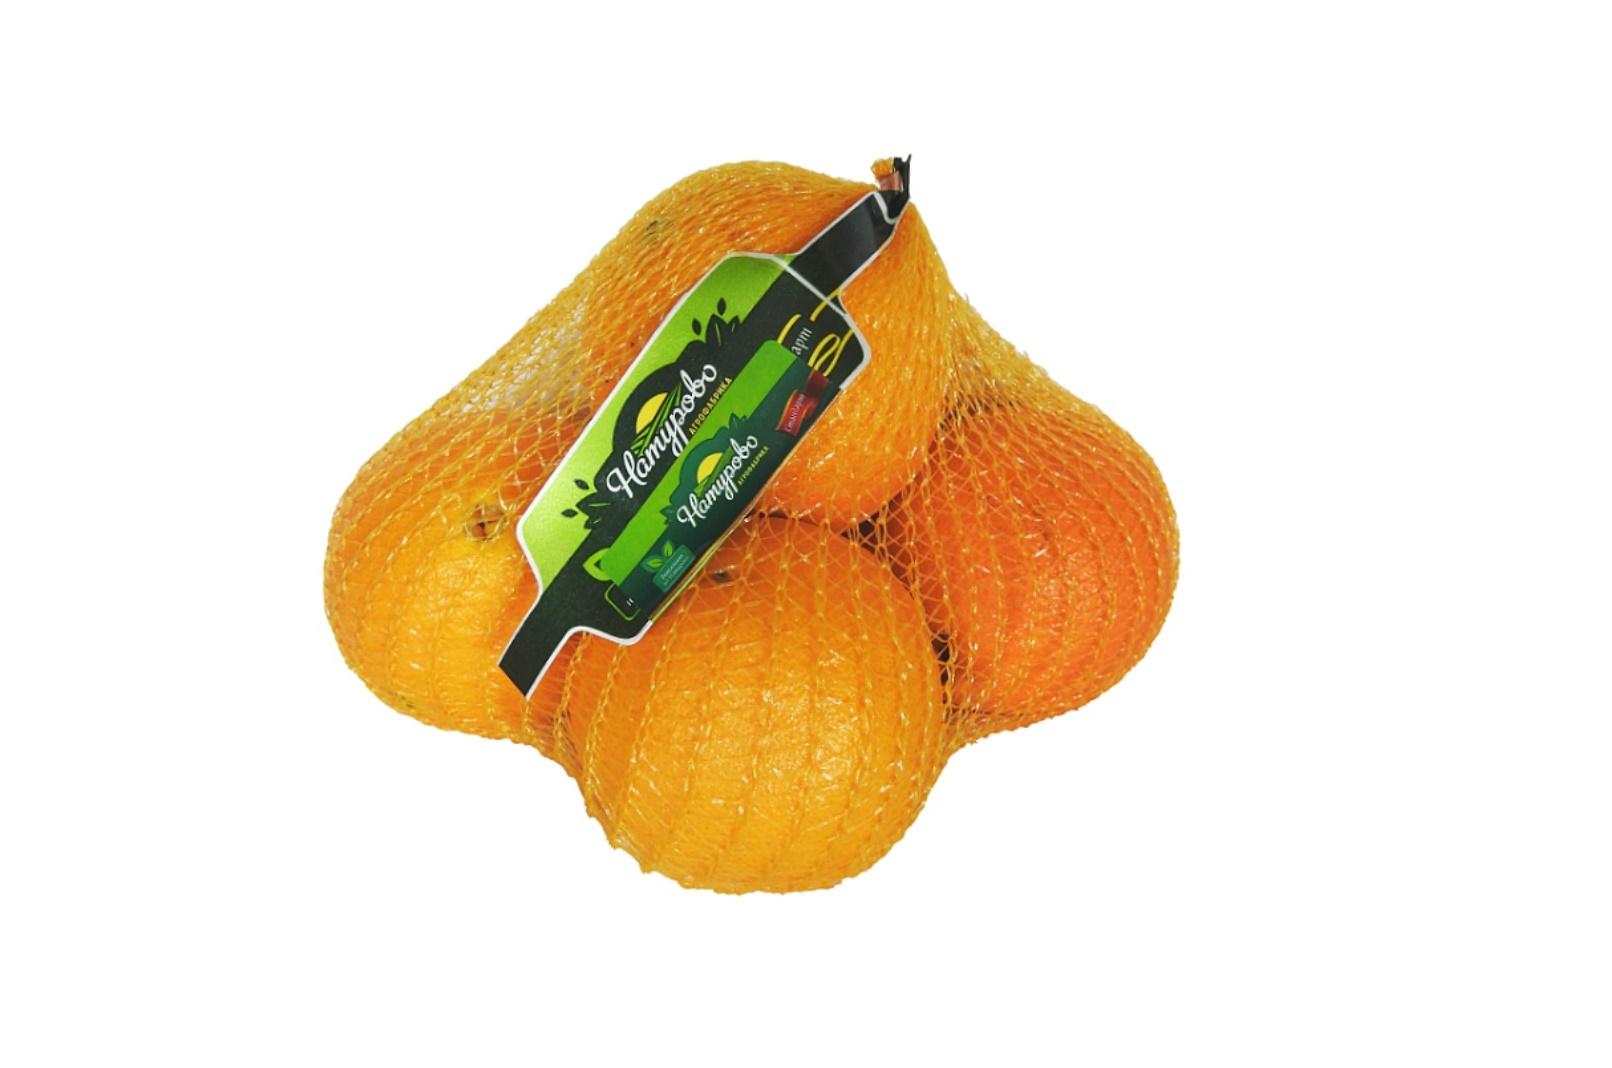 https://naturovo.ru/wp-content/uploads/2016/12/apelsiny-2.jpg